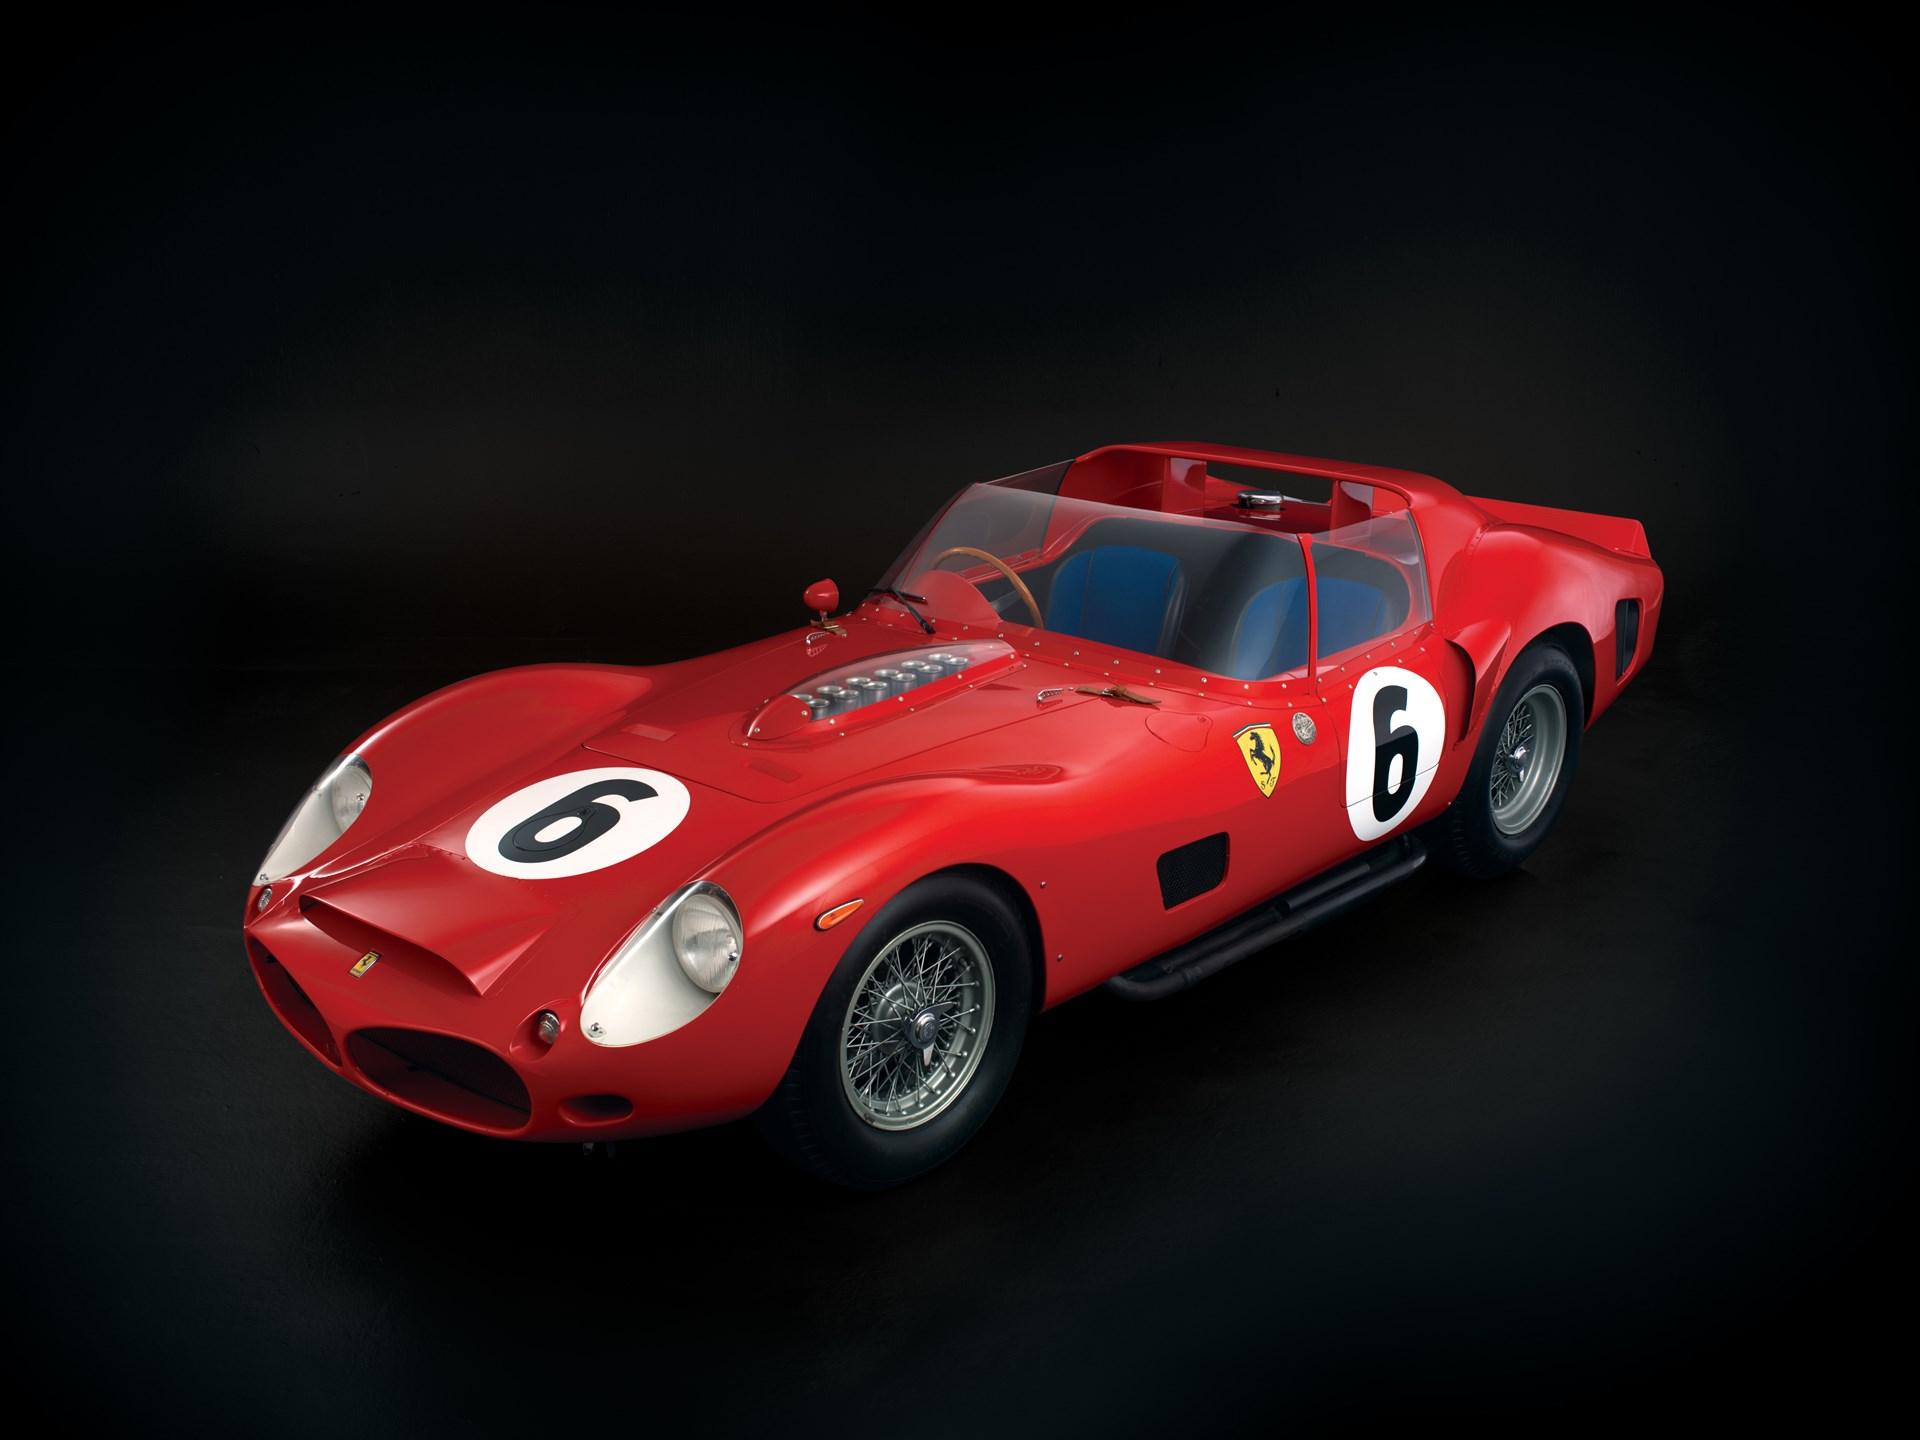 1962 Ferrari 330 TRI/LM Testa Rossa Spyder